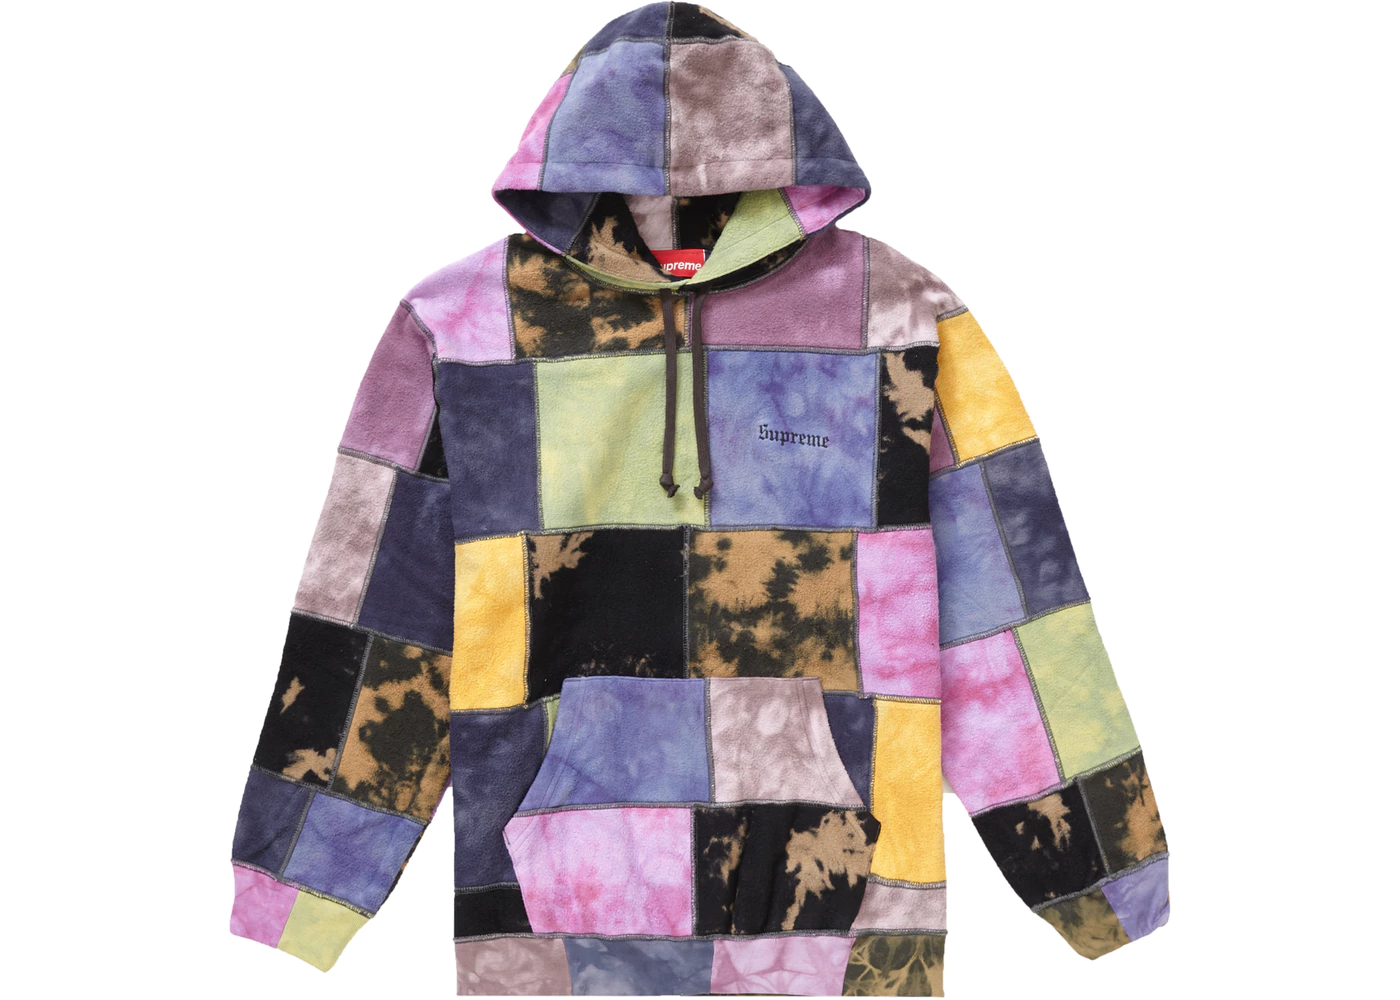 Pin By Magali Lies On Inspo In 2021 Hooded Sweatshirts Street Casual Men Sweatshirts [ 1000 x 1400 Pixel ]